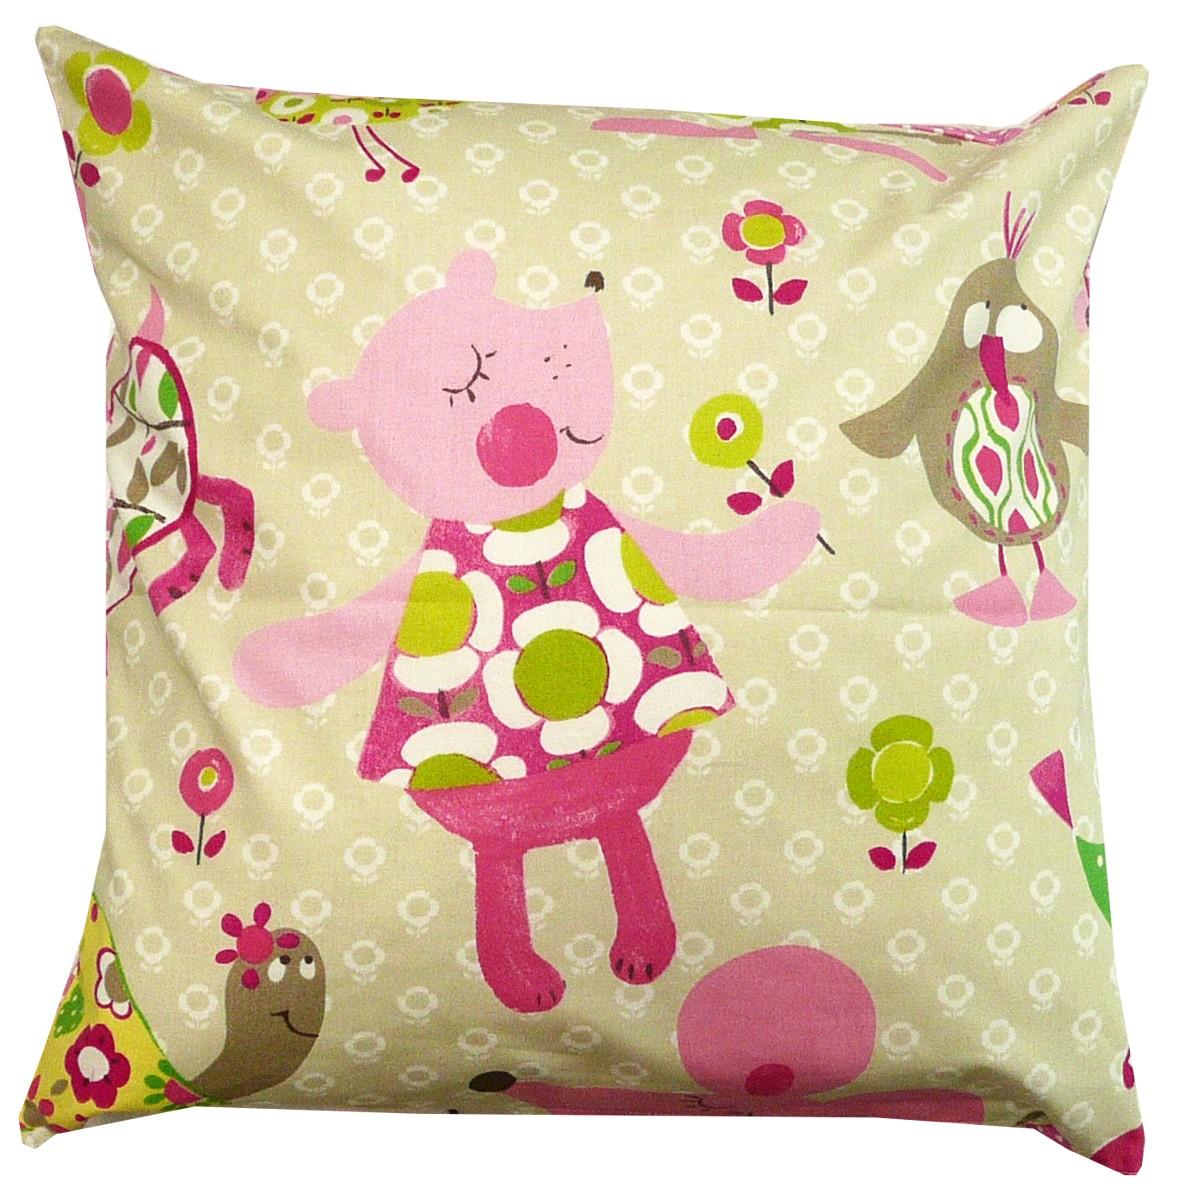 Kissenhülle Amelie&Friends sand Dinky Dots 50x50 pink